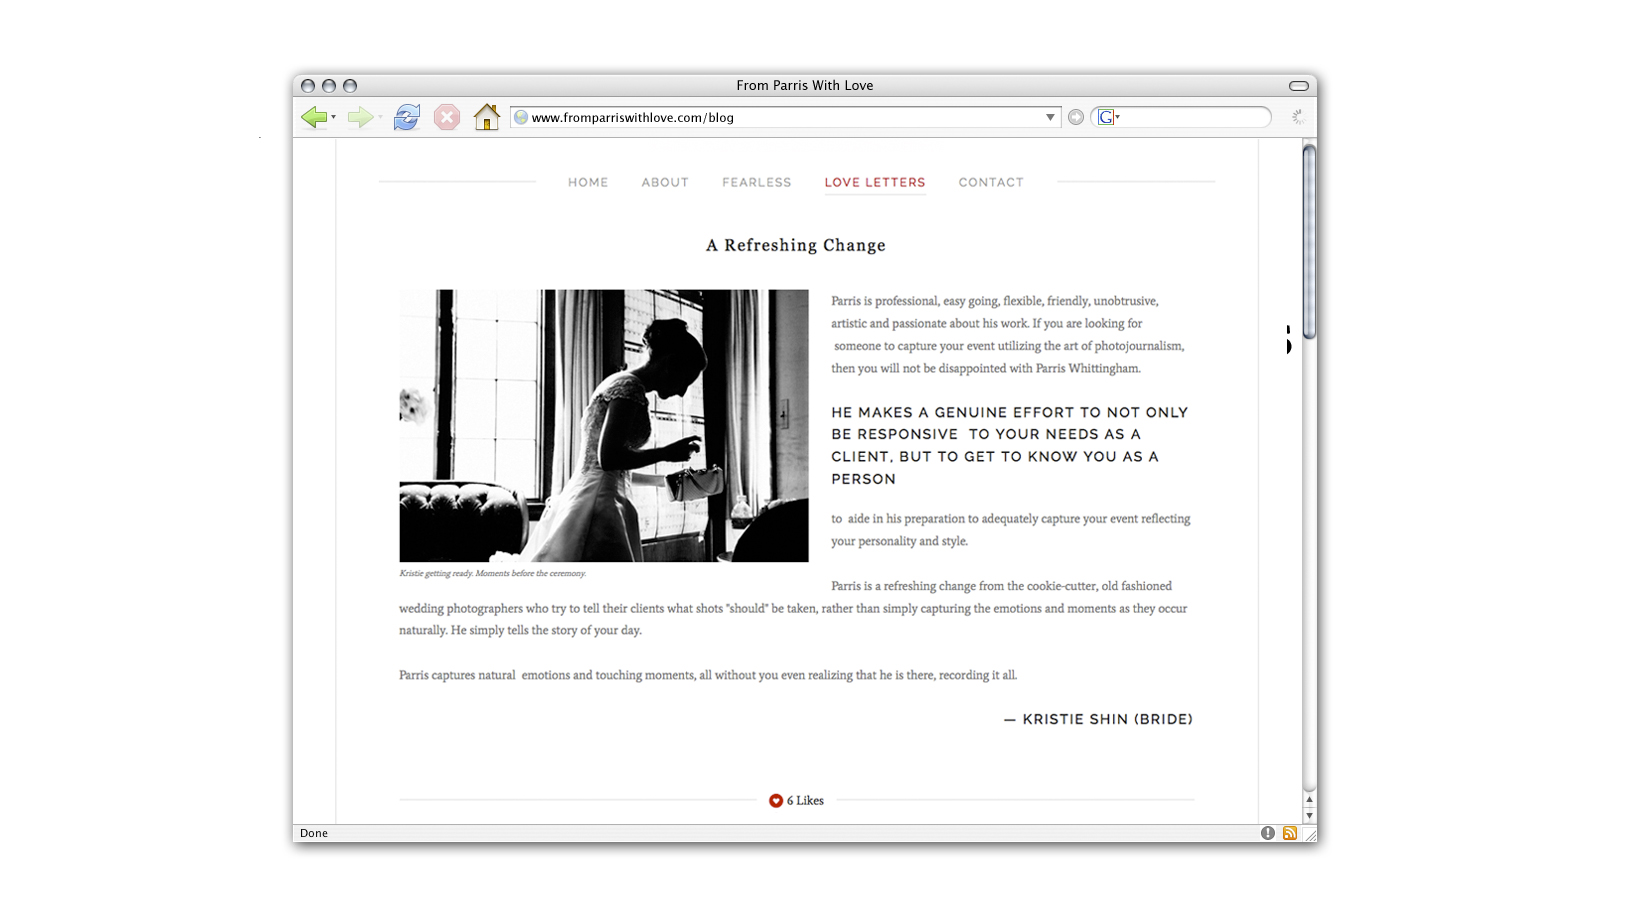 FPWL_behance_website_BLOG.jpg